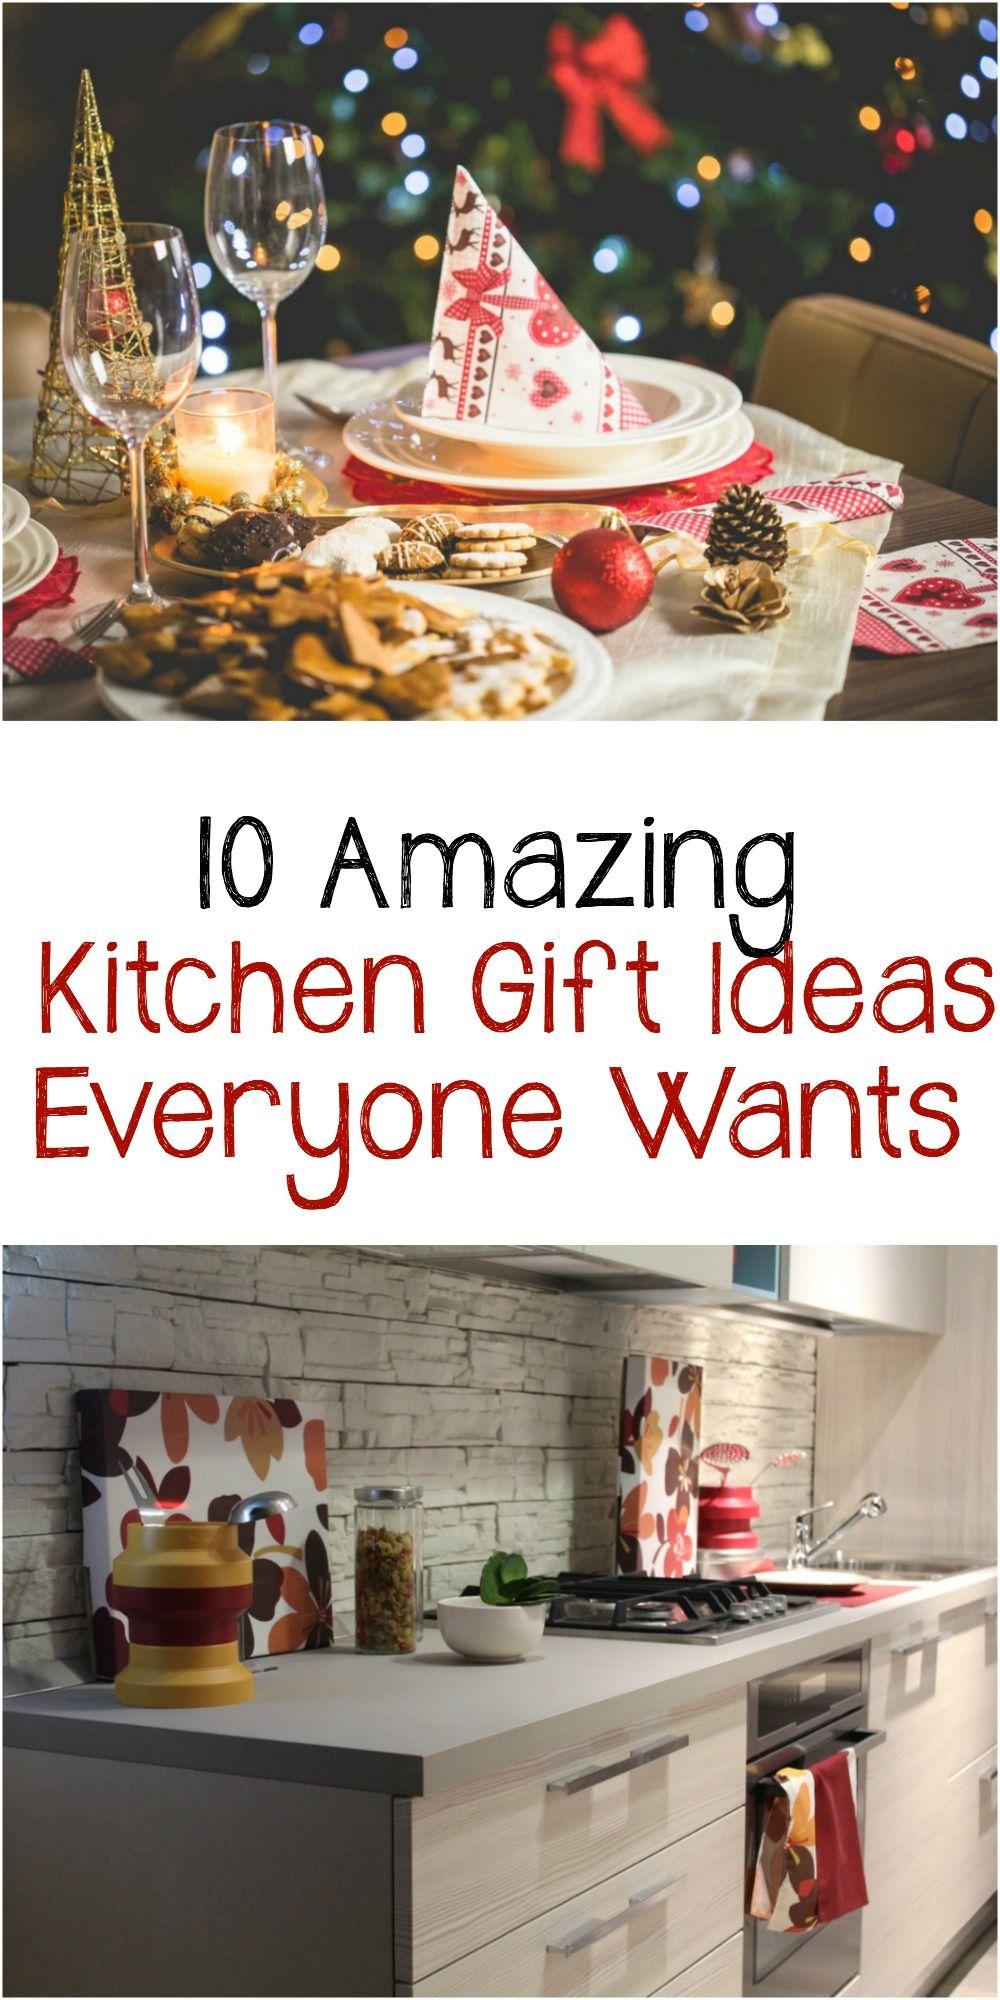 10 Amazing Kitchen Gift Ideas Everyone Wants | Gift